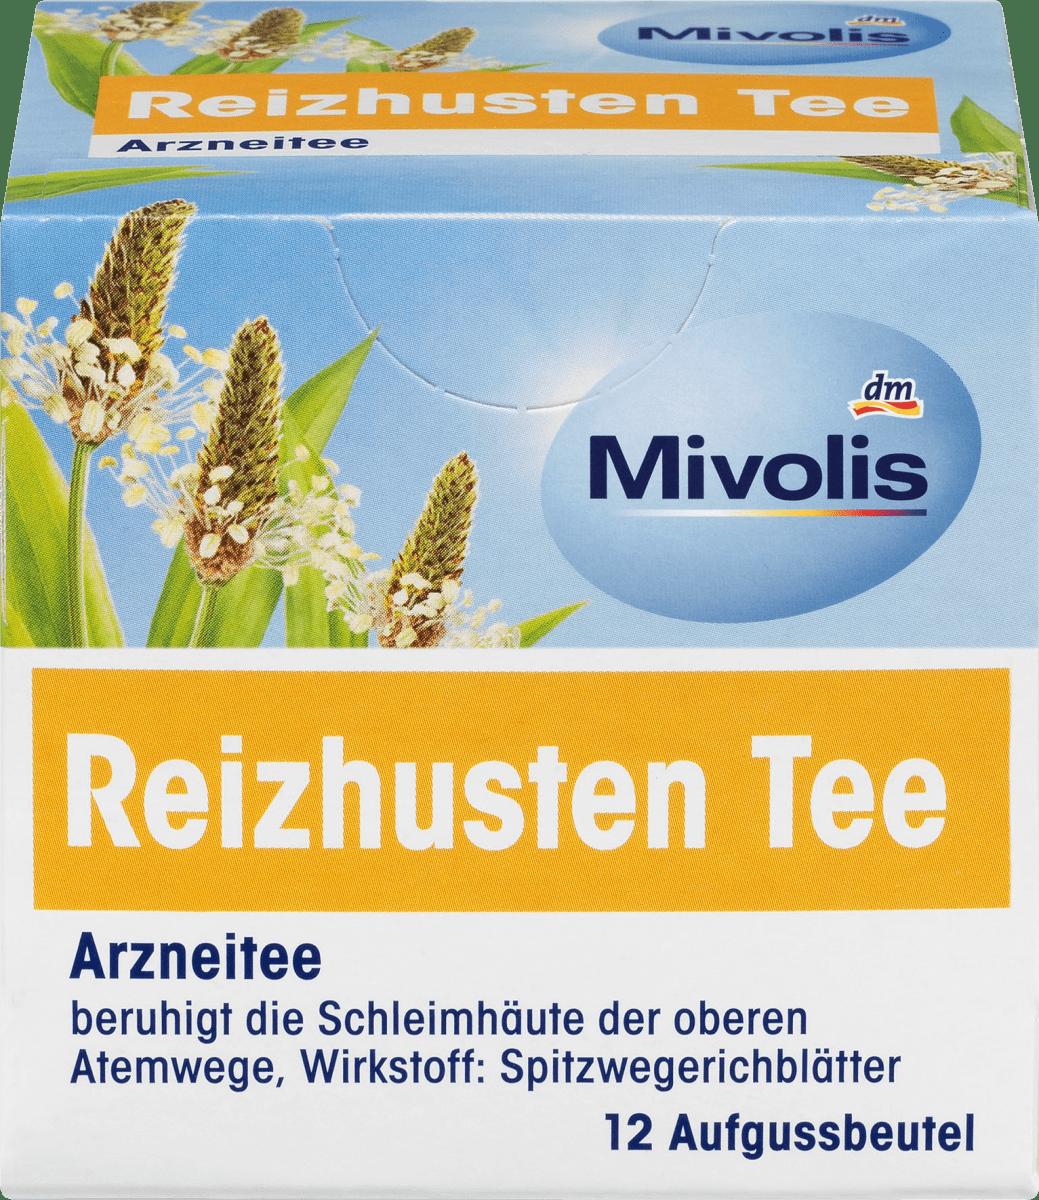 Arznei-Tee, Reizhusten Tee (12 x 1,4 g), 16,8 g